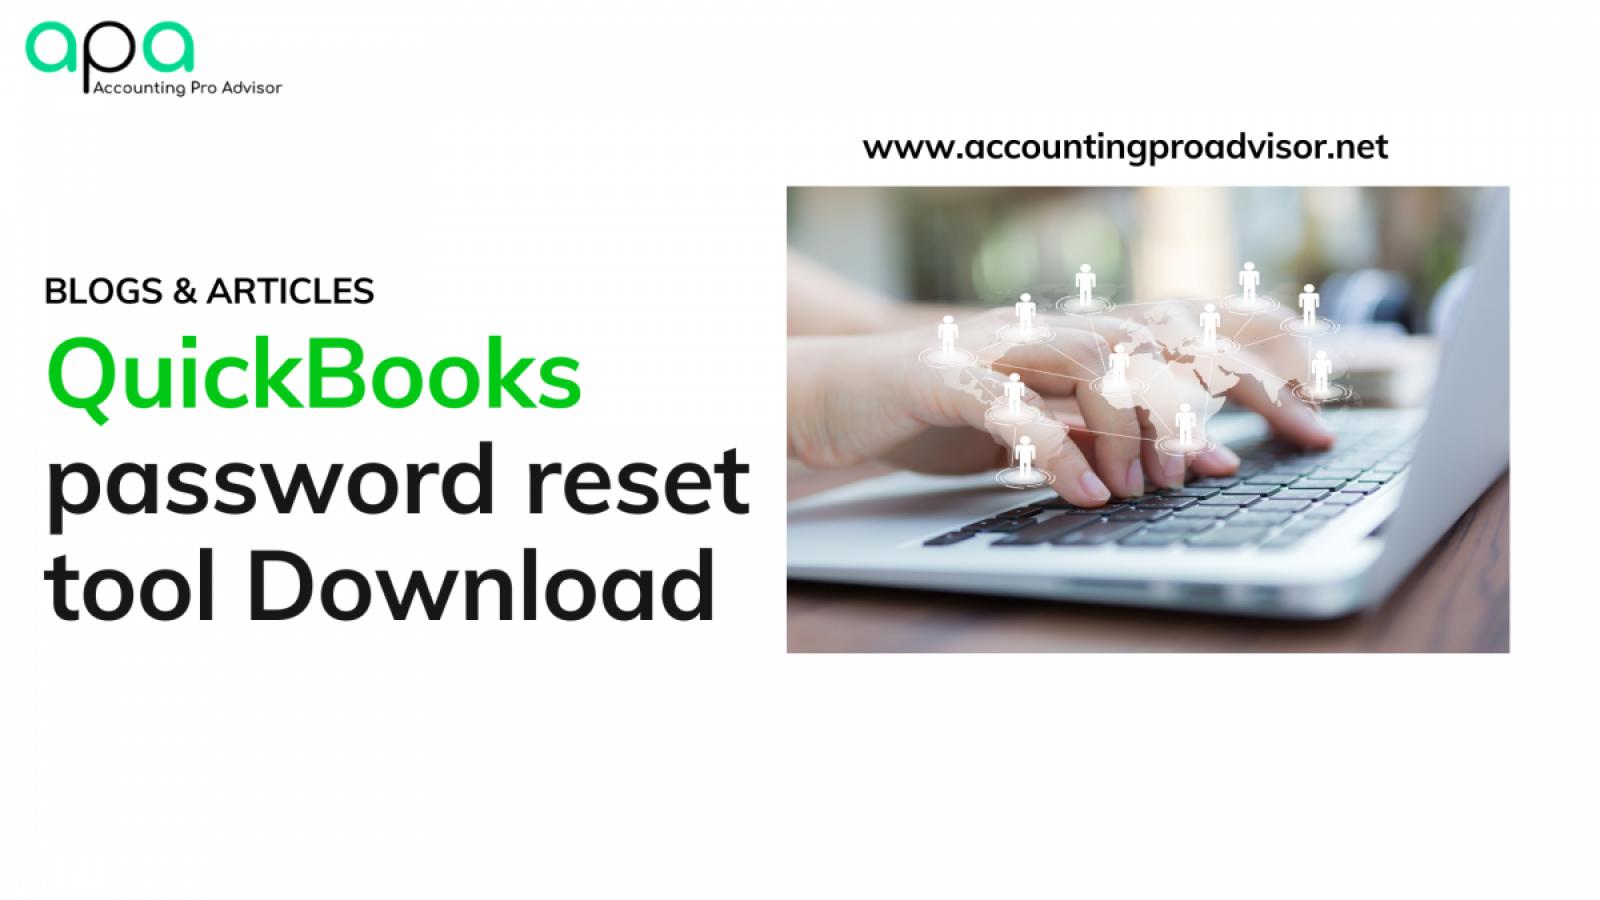 QuickBooks password reset tool